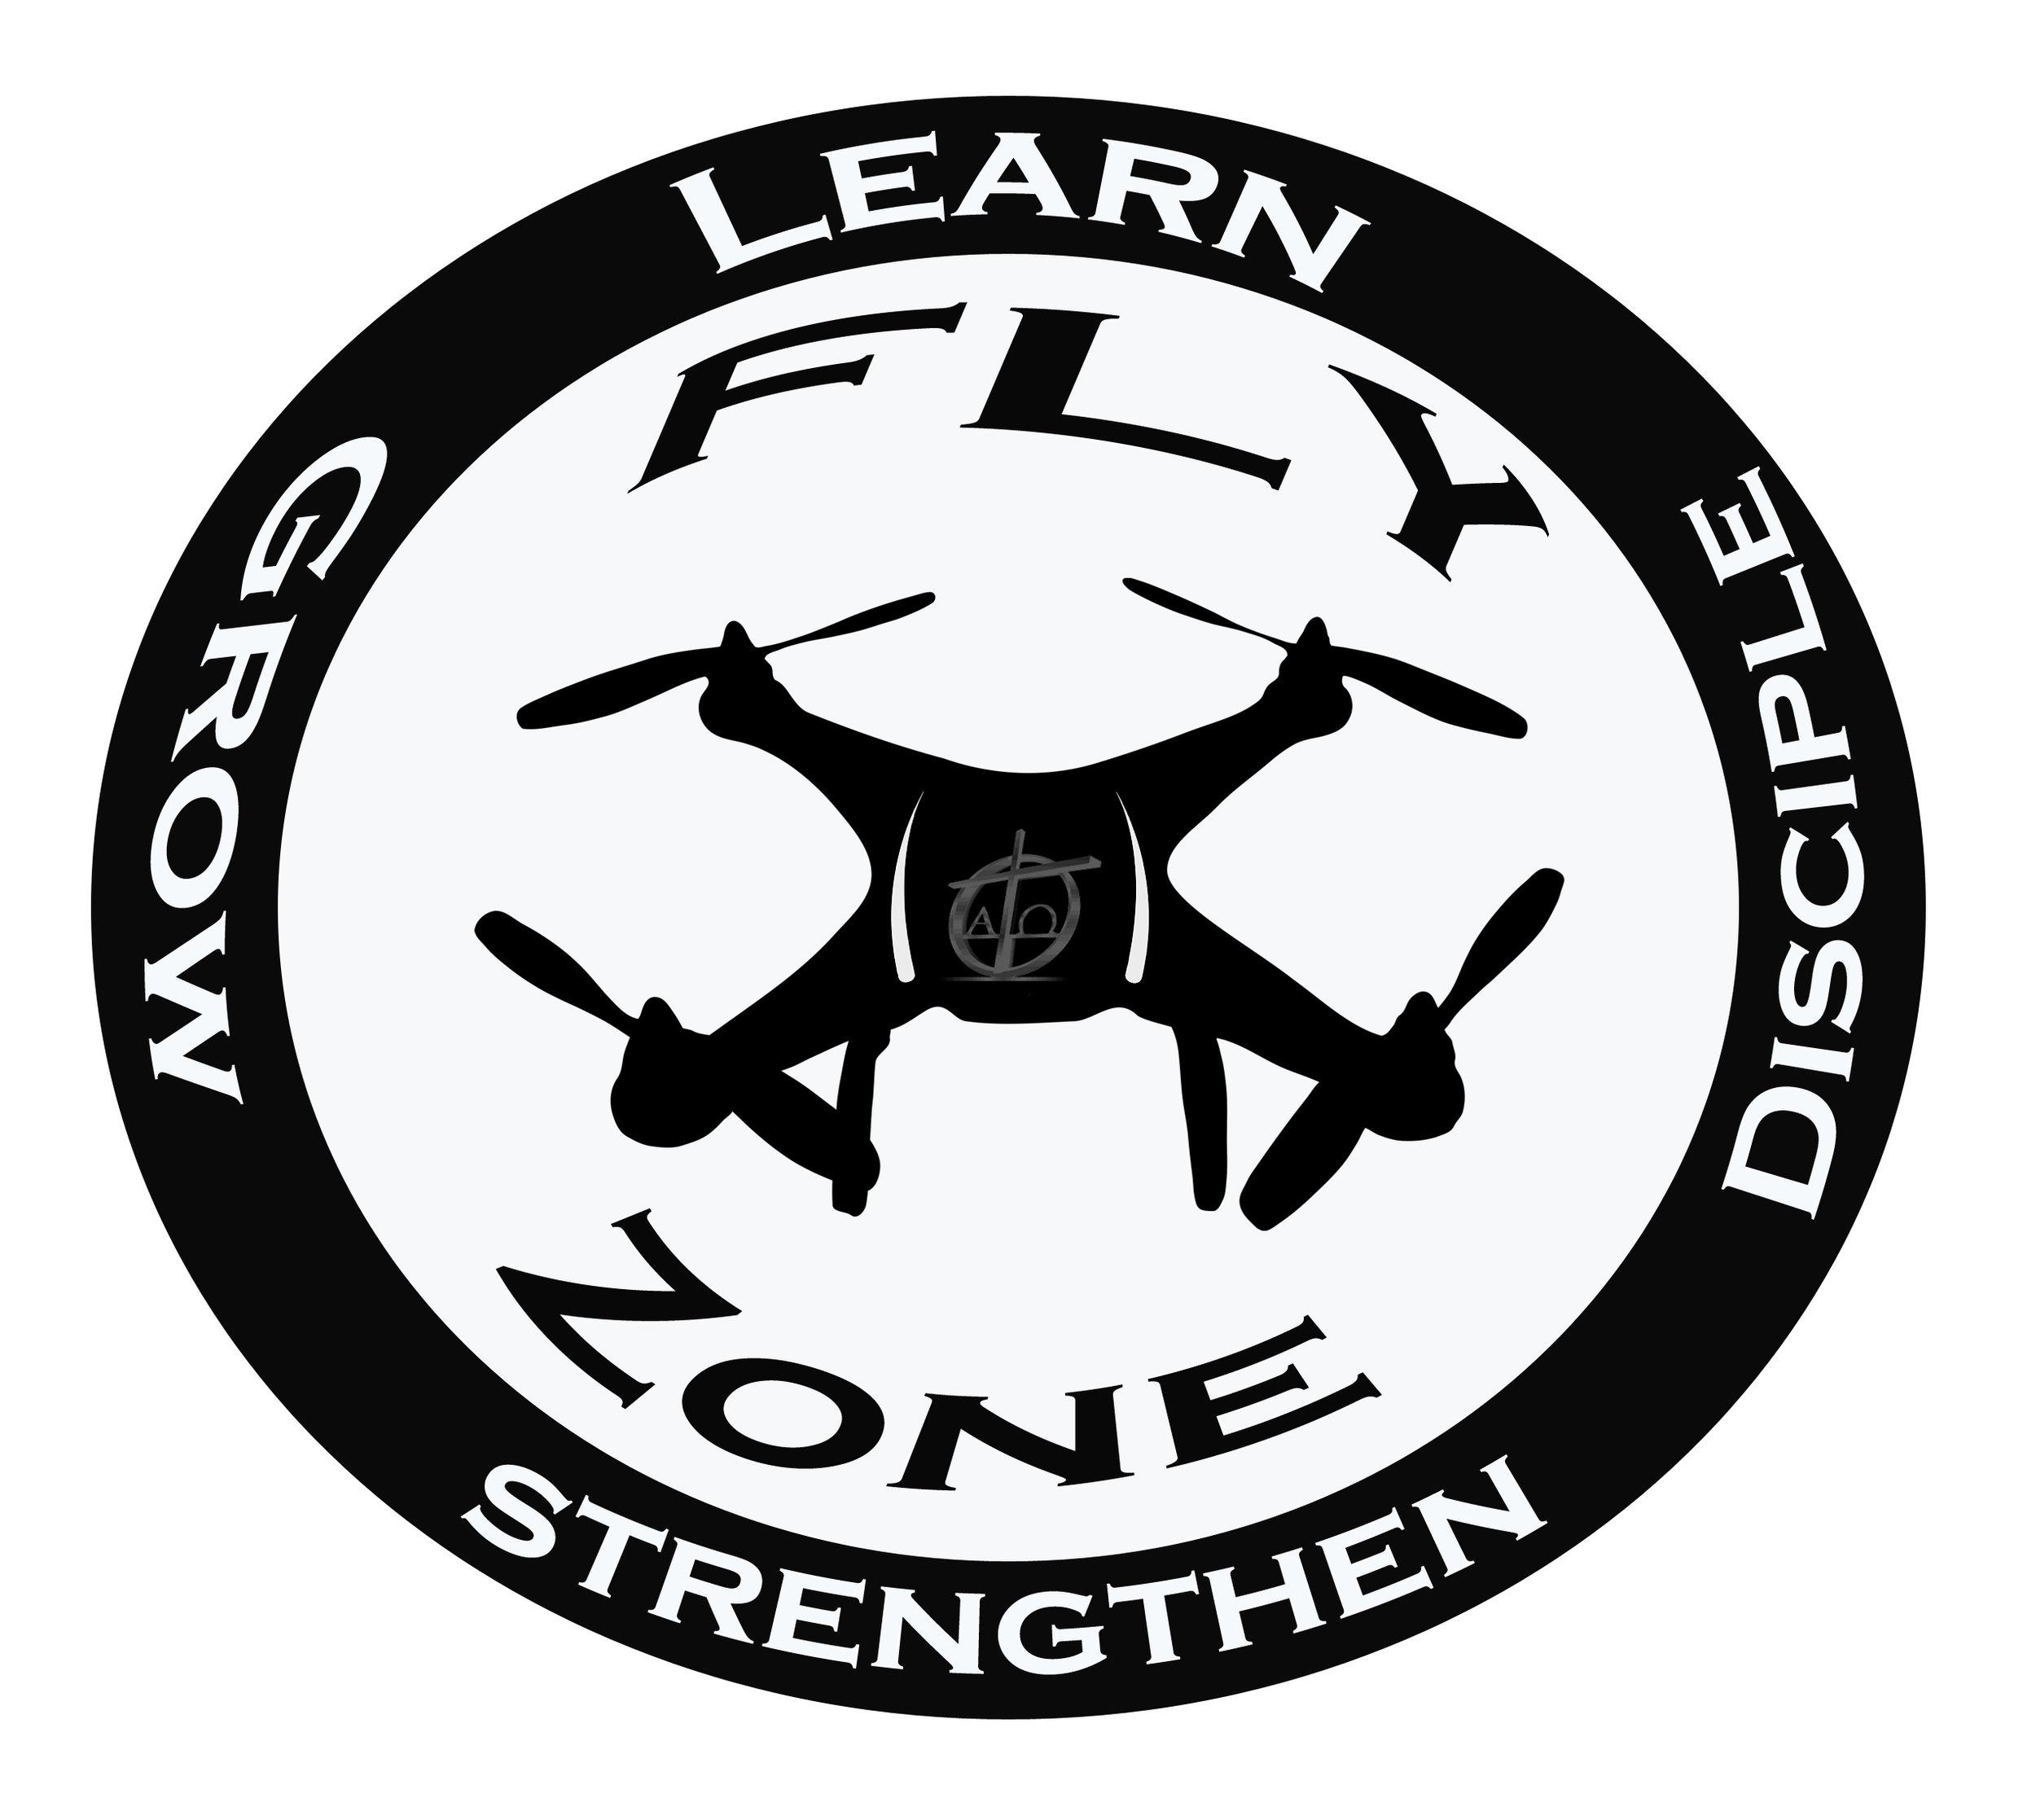 logo drone revised4.jpg